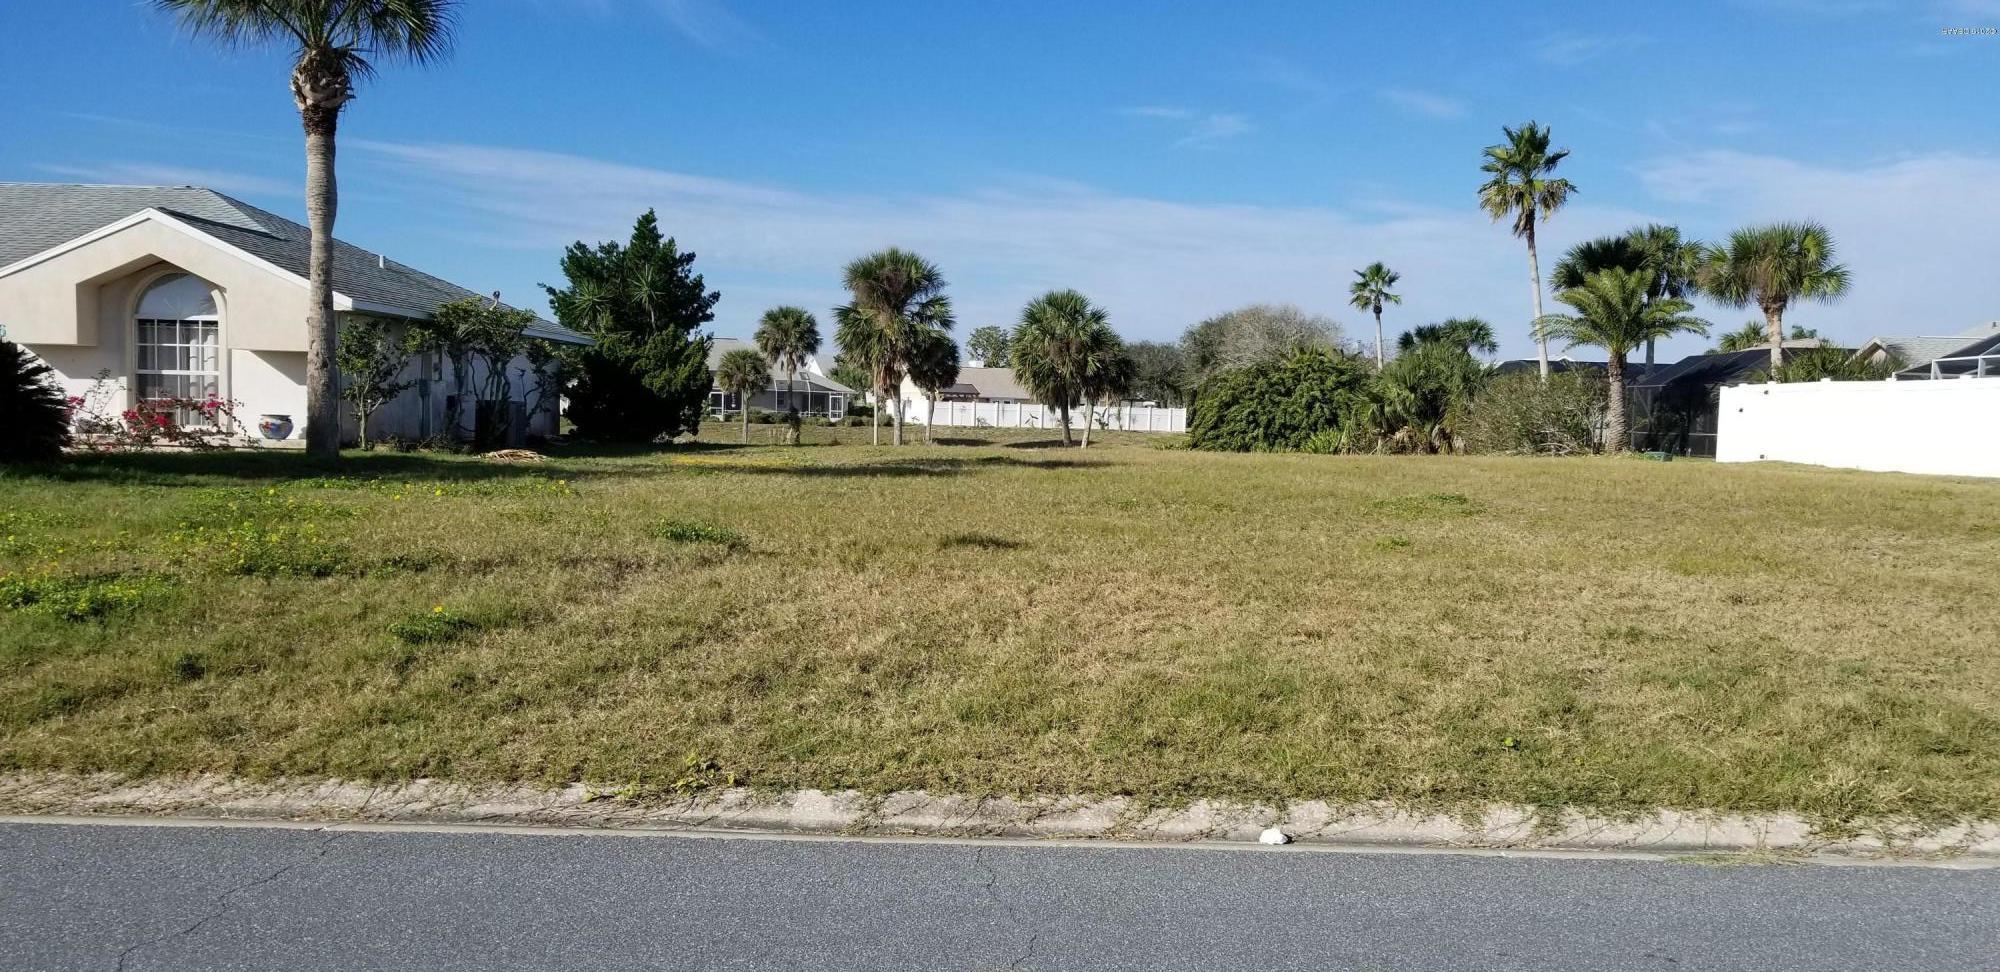 4  Sea Raven Terrace, Ormond-By-The-Sea in Volusia County, FL 32176 Home for Sale